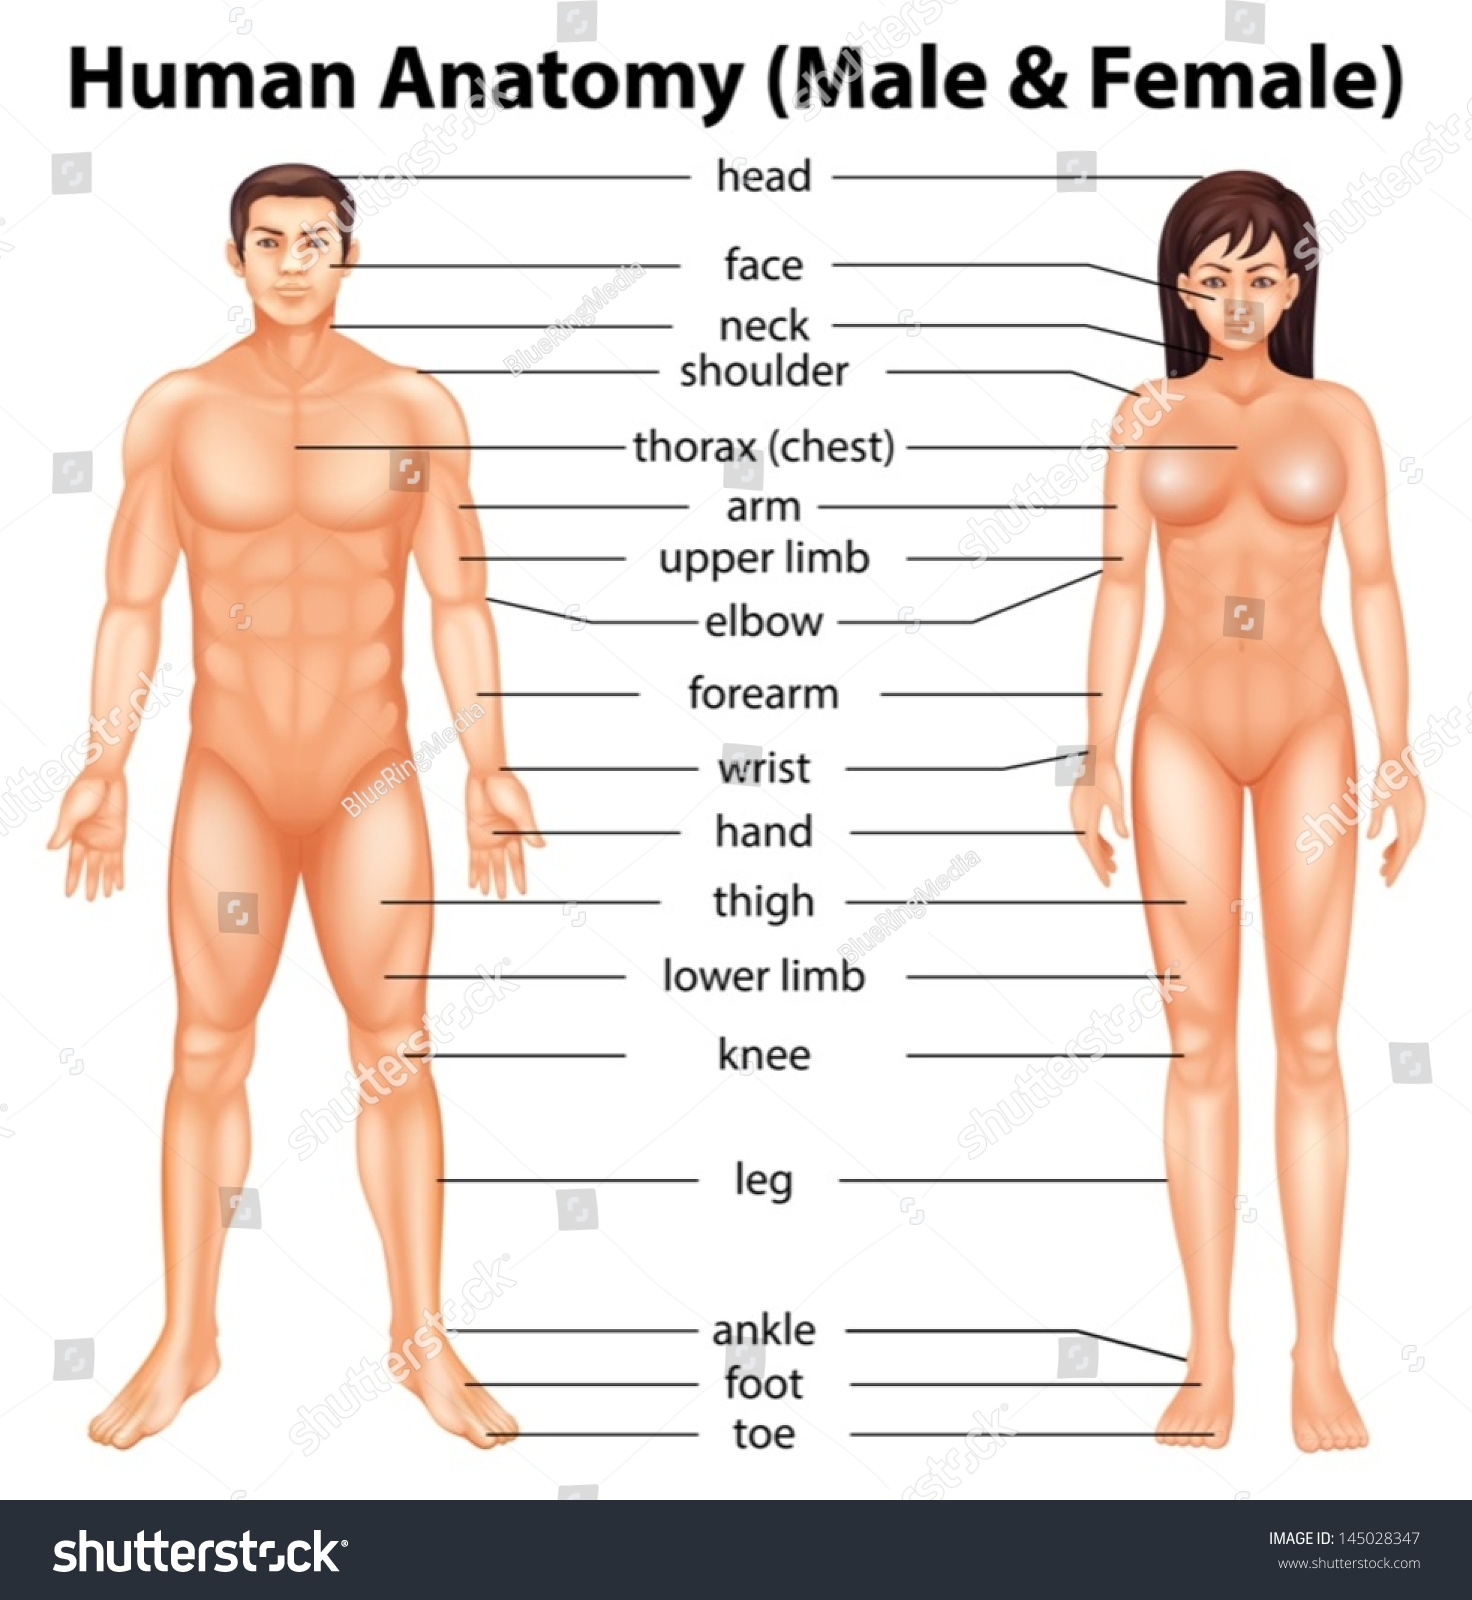 Female Human Body Images Stock Photos amp Vectors